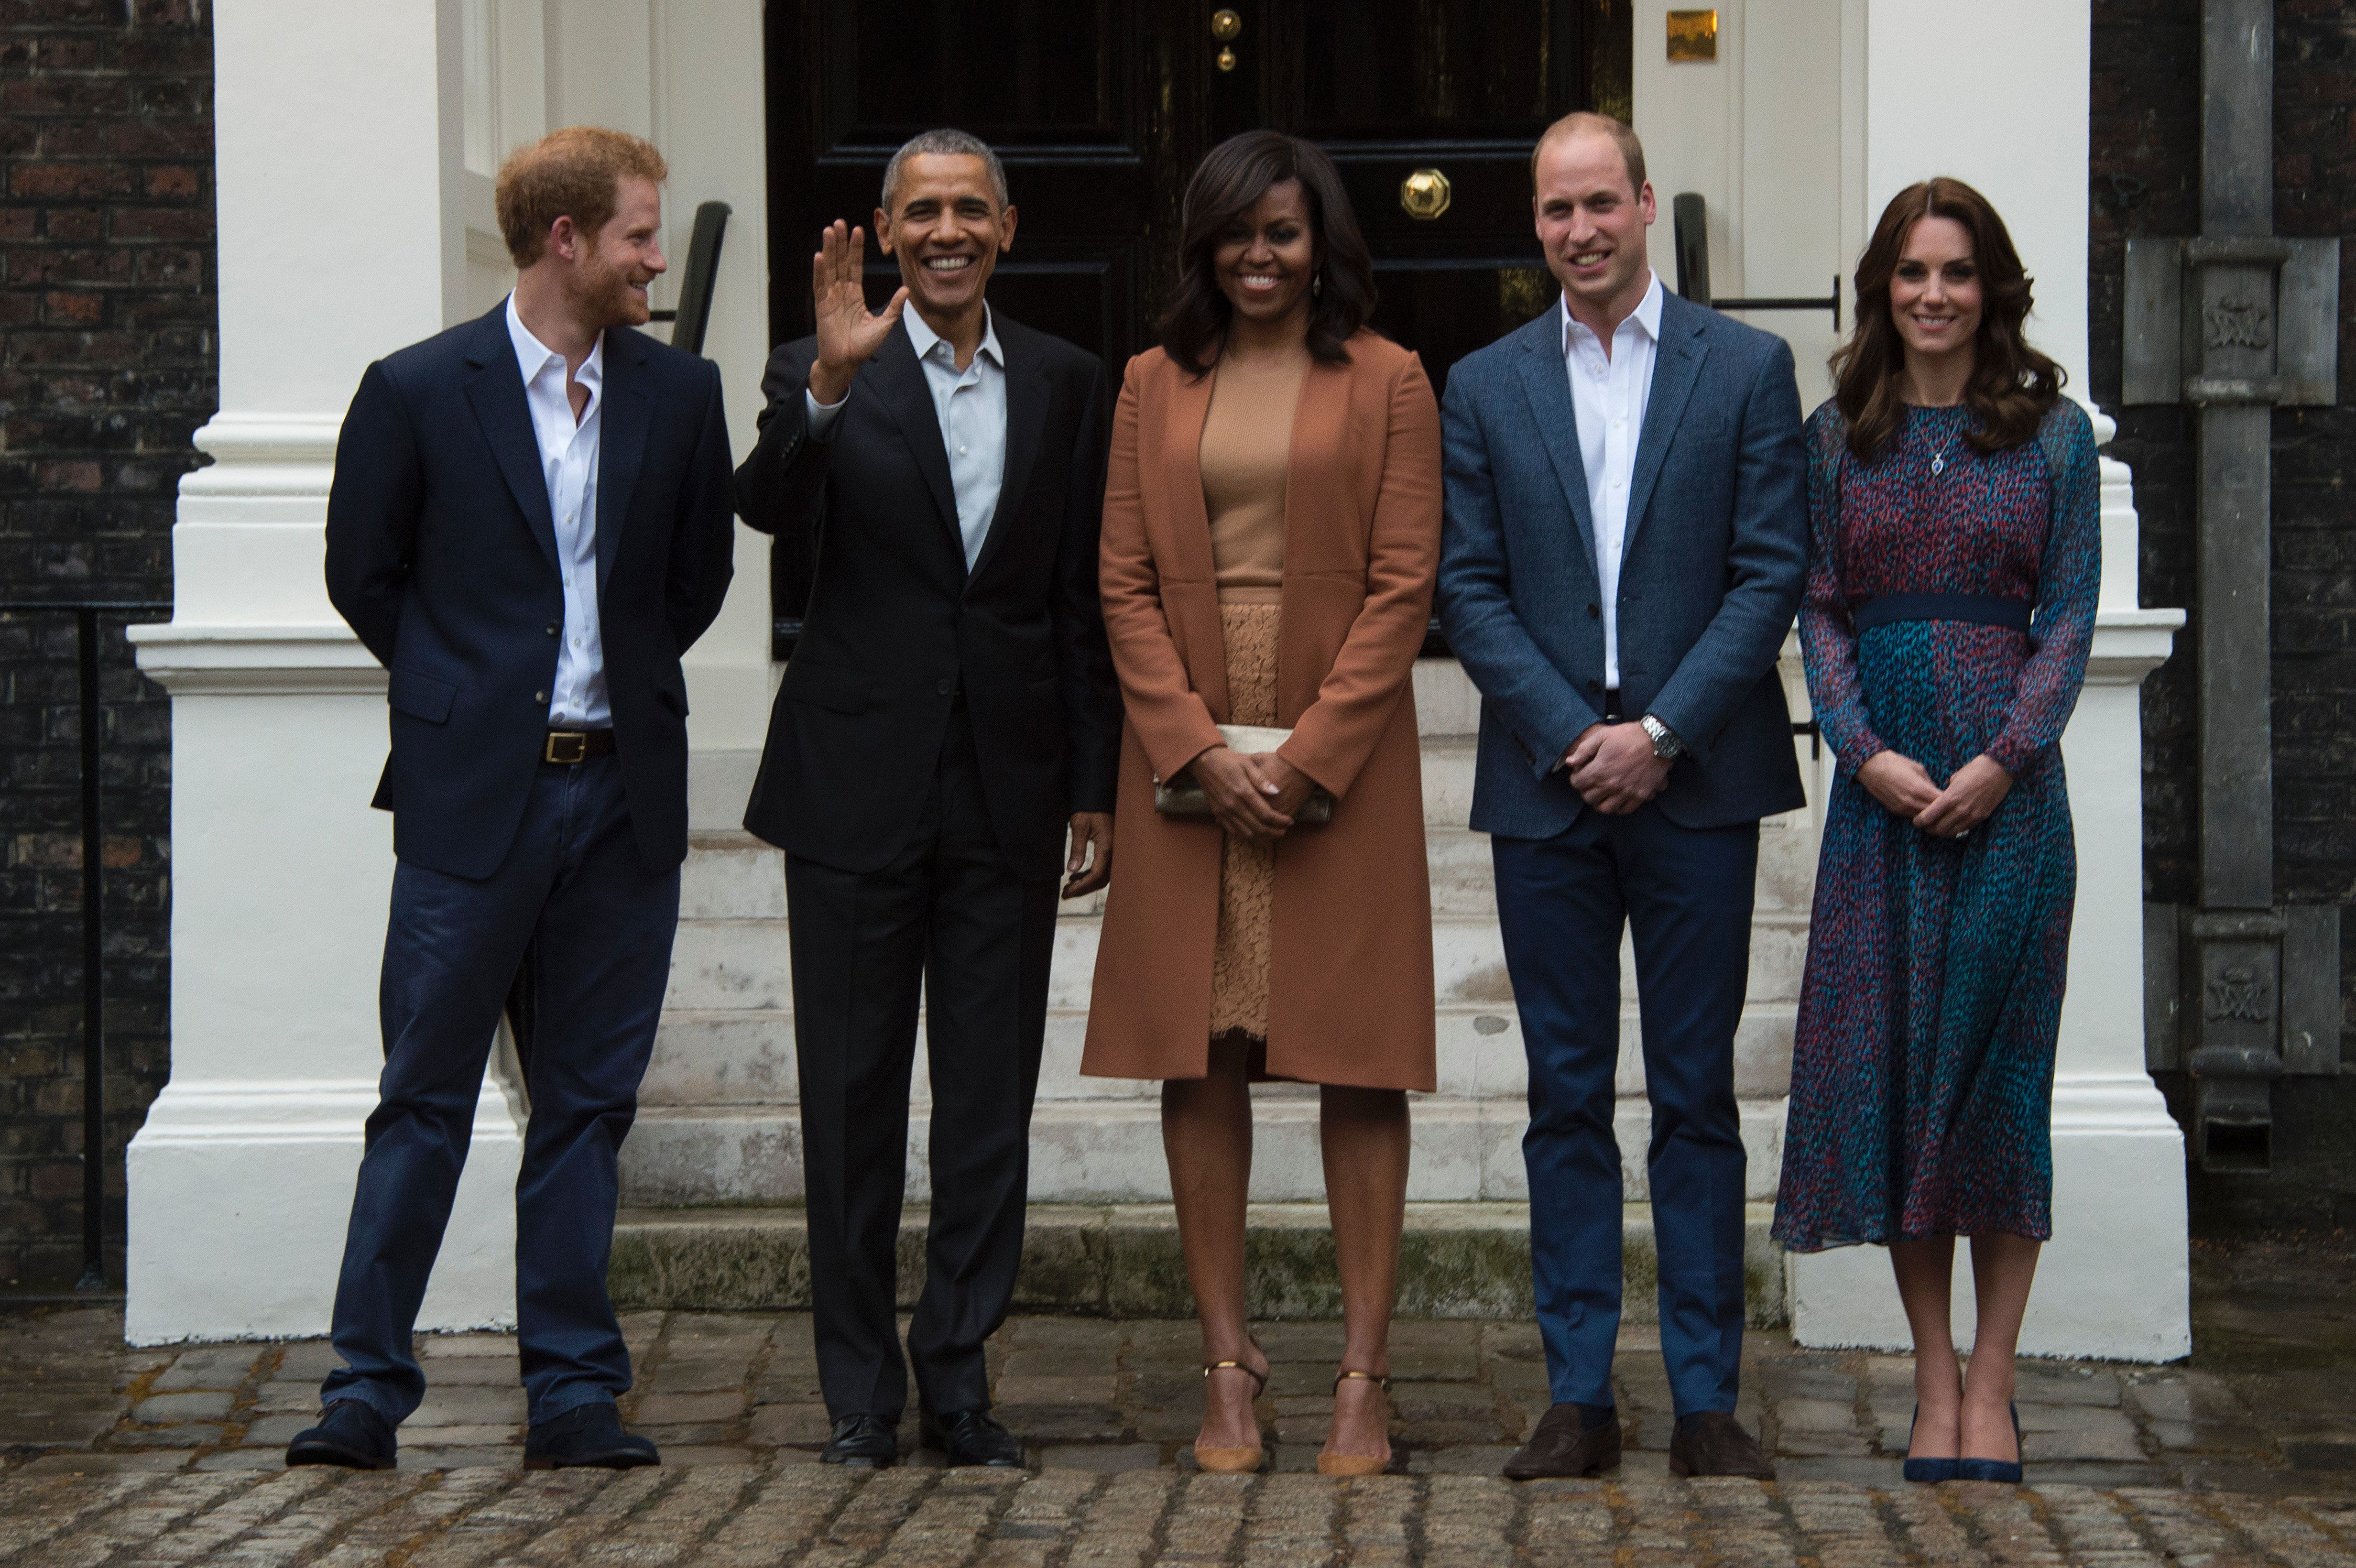 prince harry obama royal family